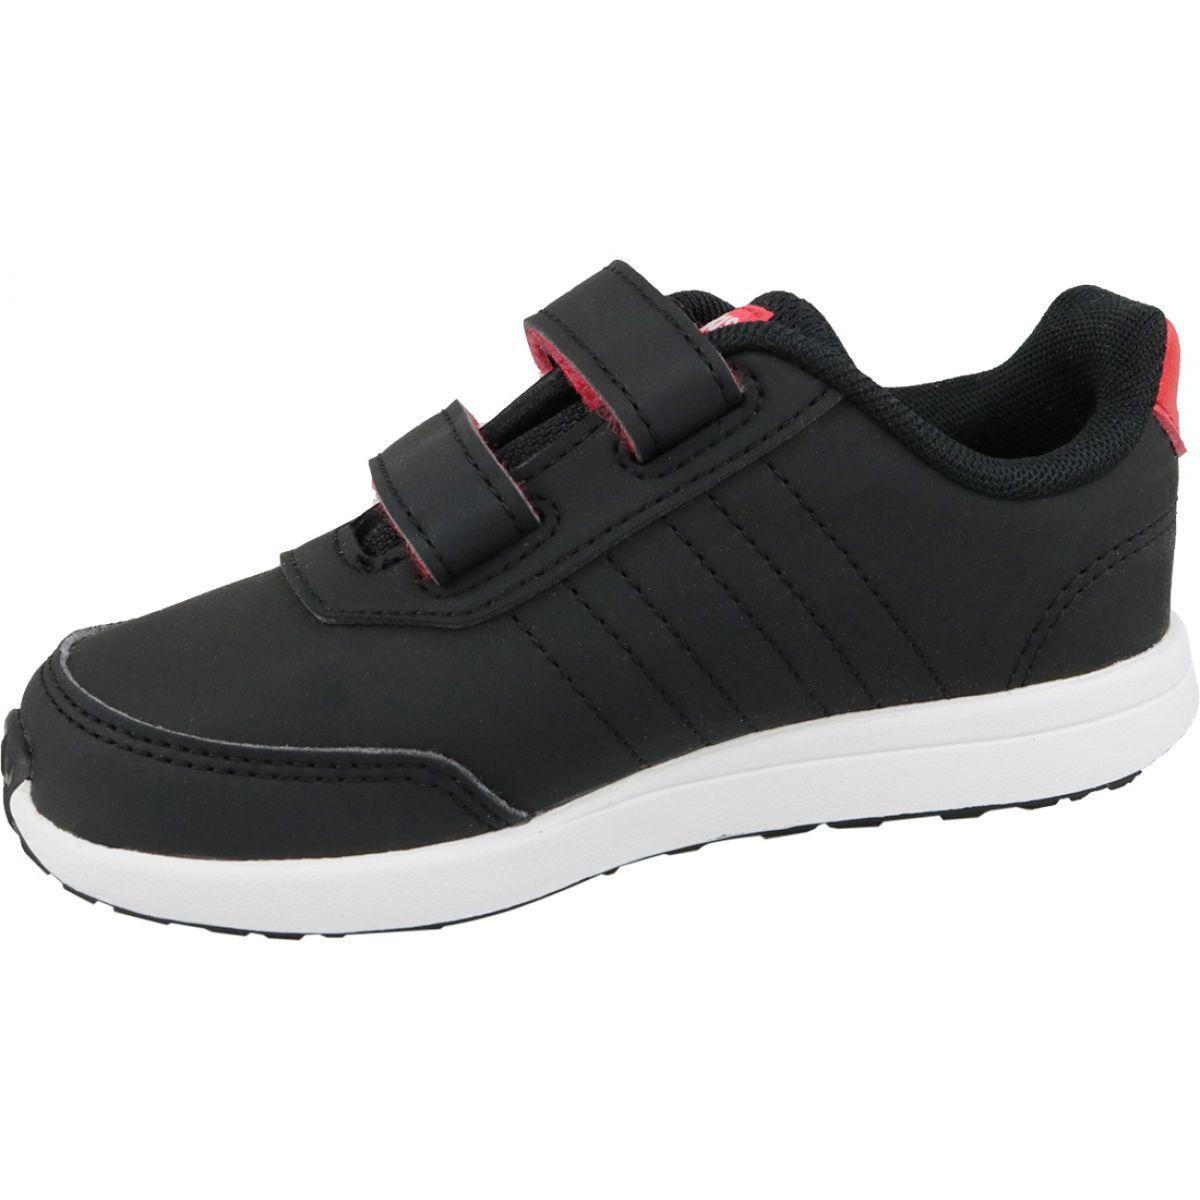 Buty Adidas Vs Switch 2 Cmf Inf Jr F35703 Czarne Sports Shoes Adidas Black Shoes Adidas